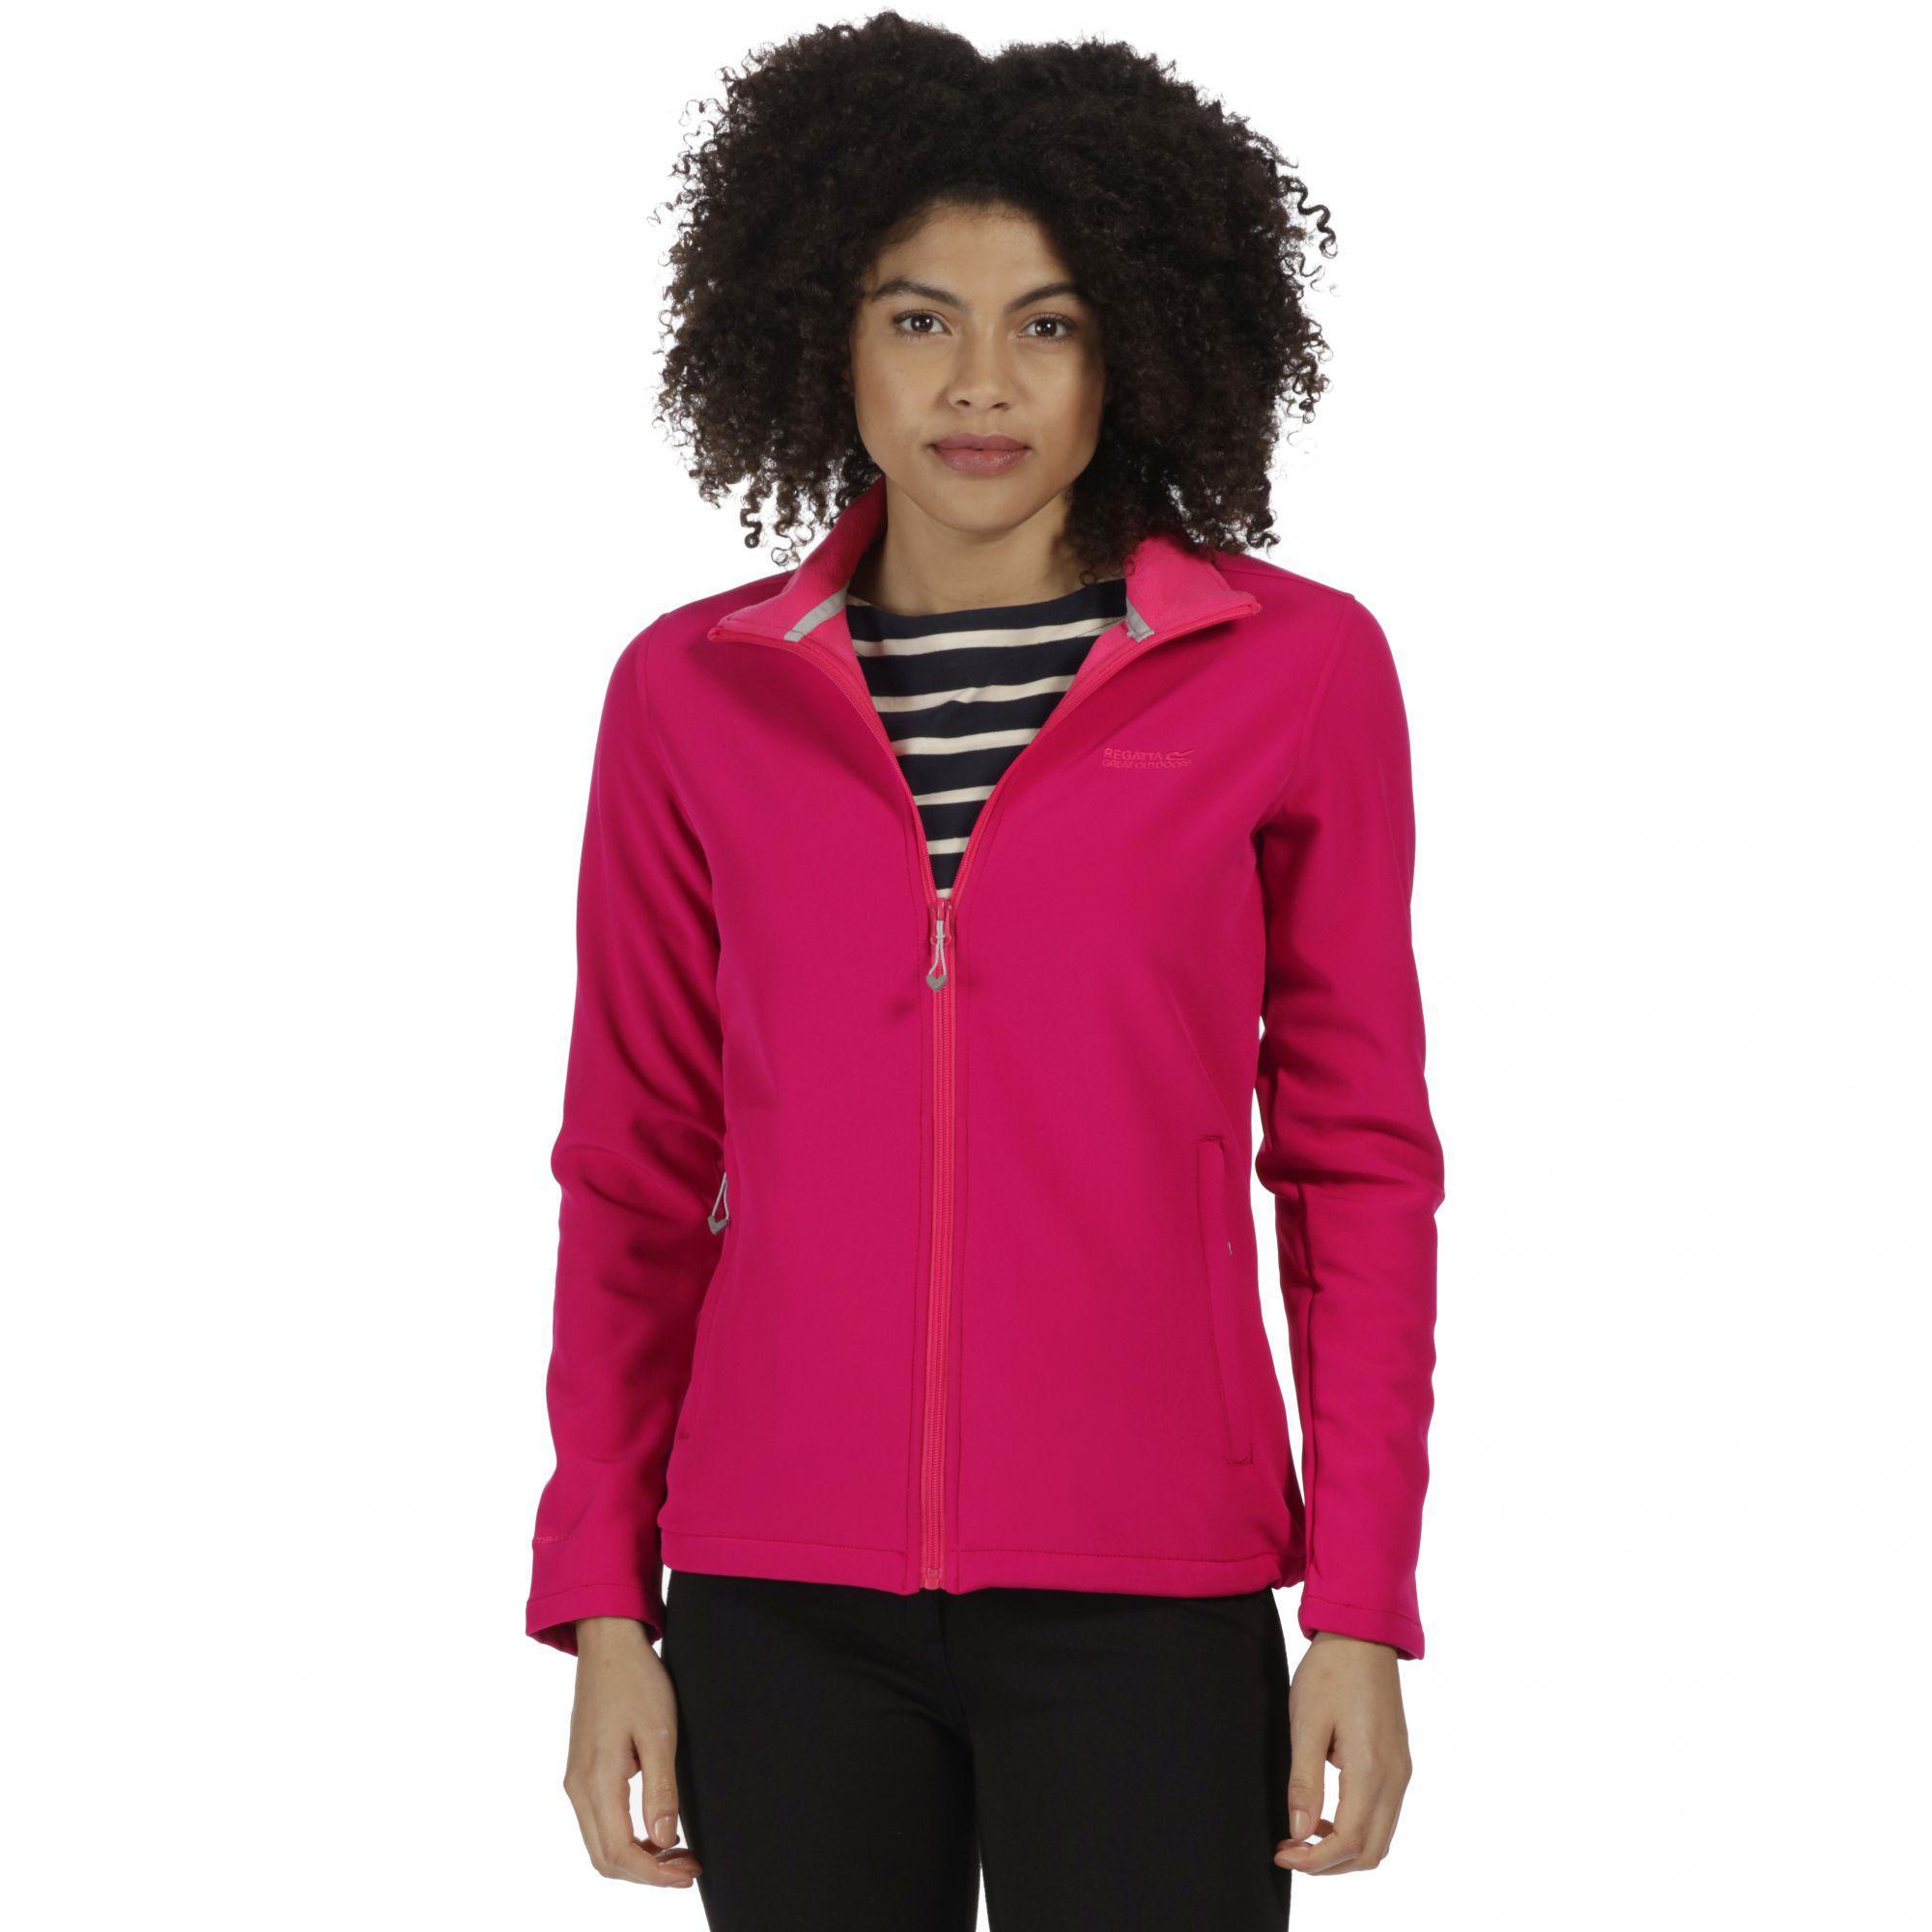 Lyst - Regatta Pink  connie  Softshell Jacket in Pink afc0900c8d